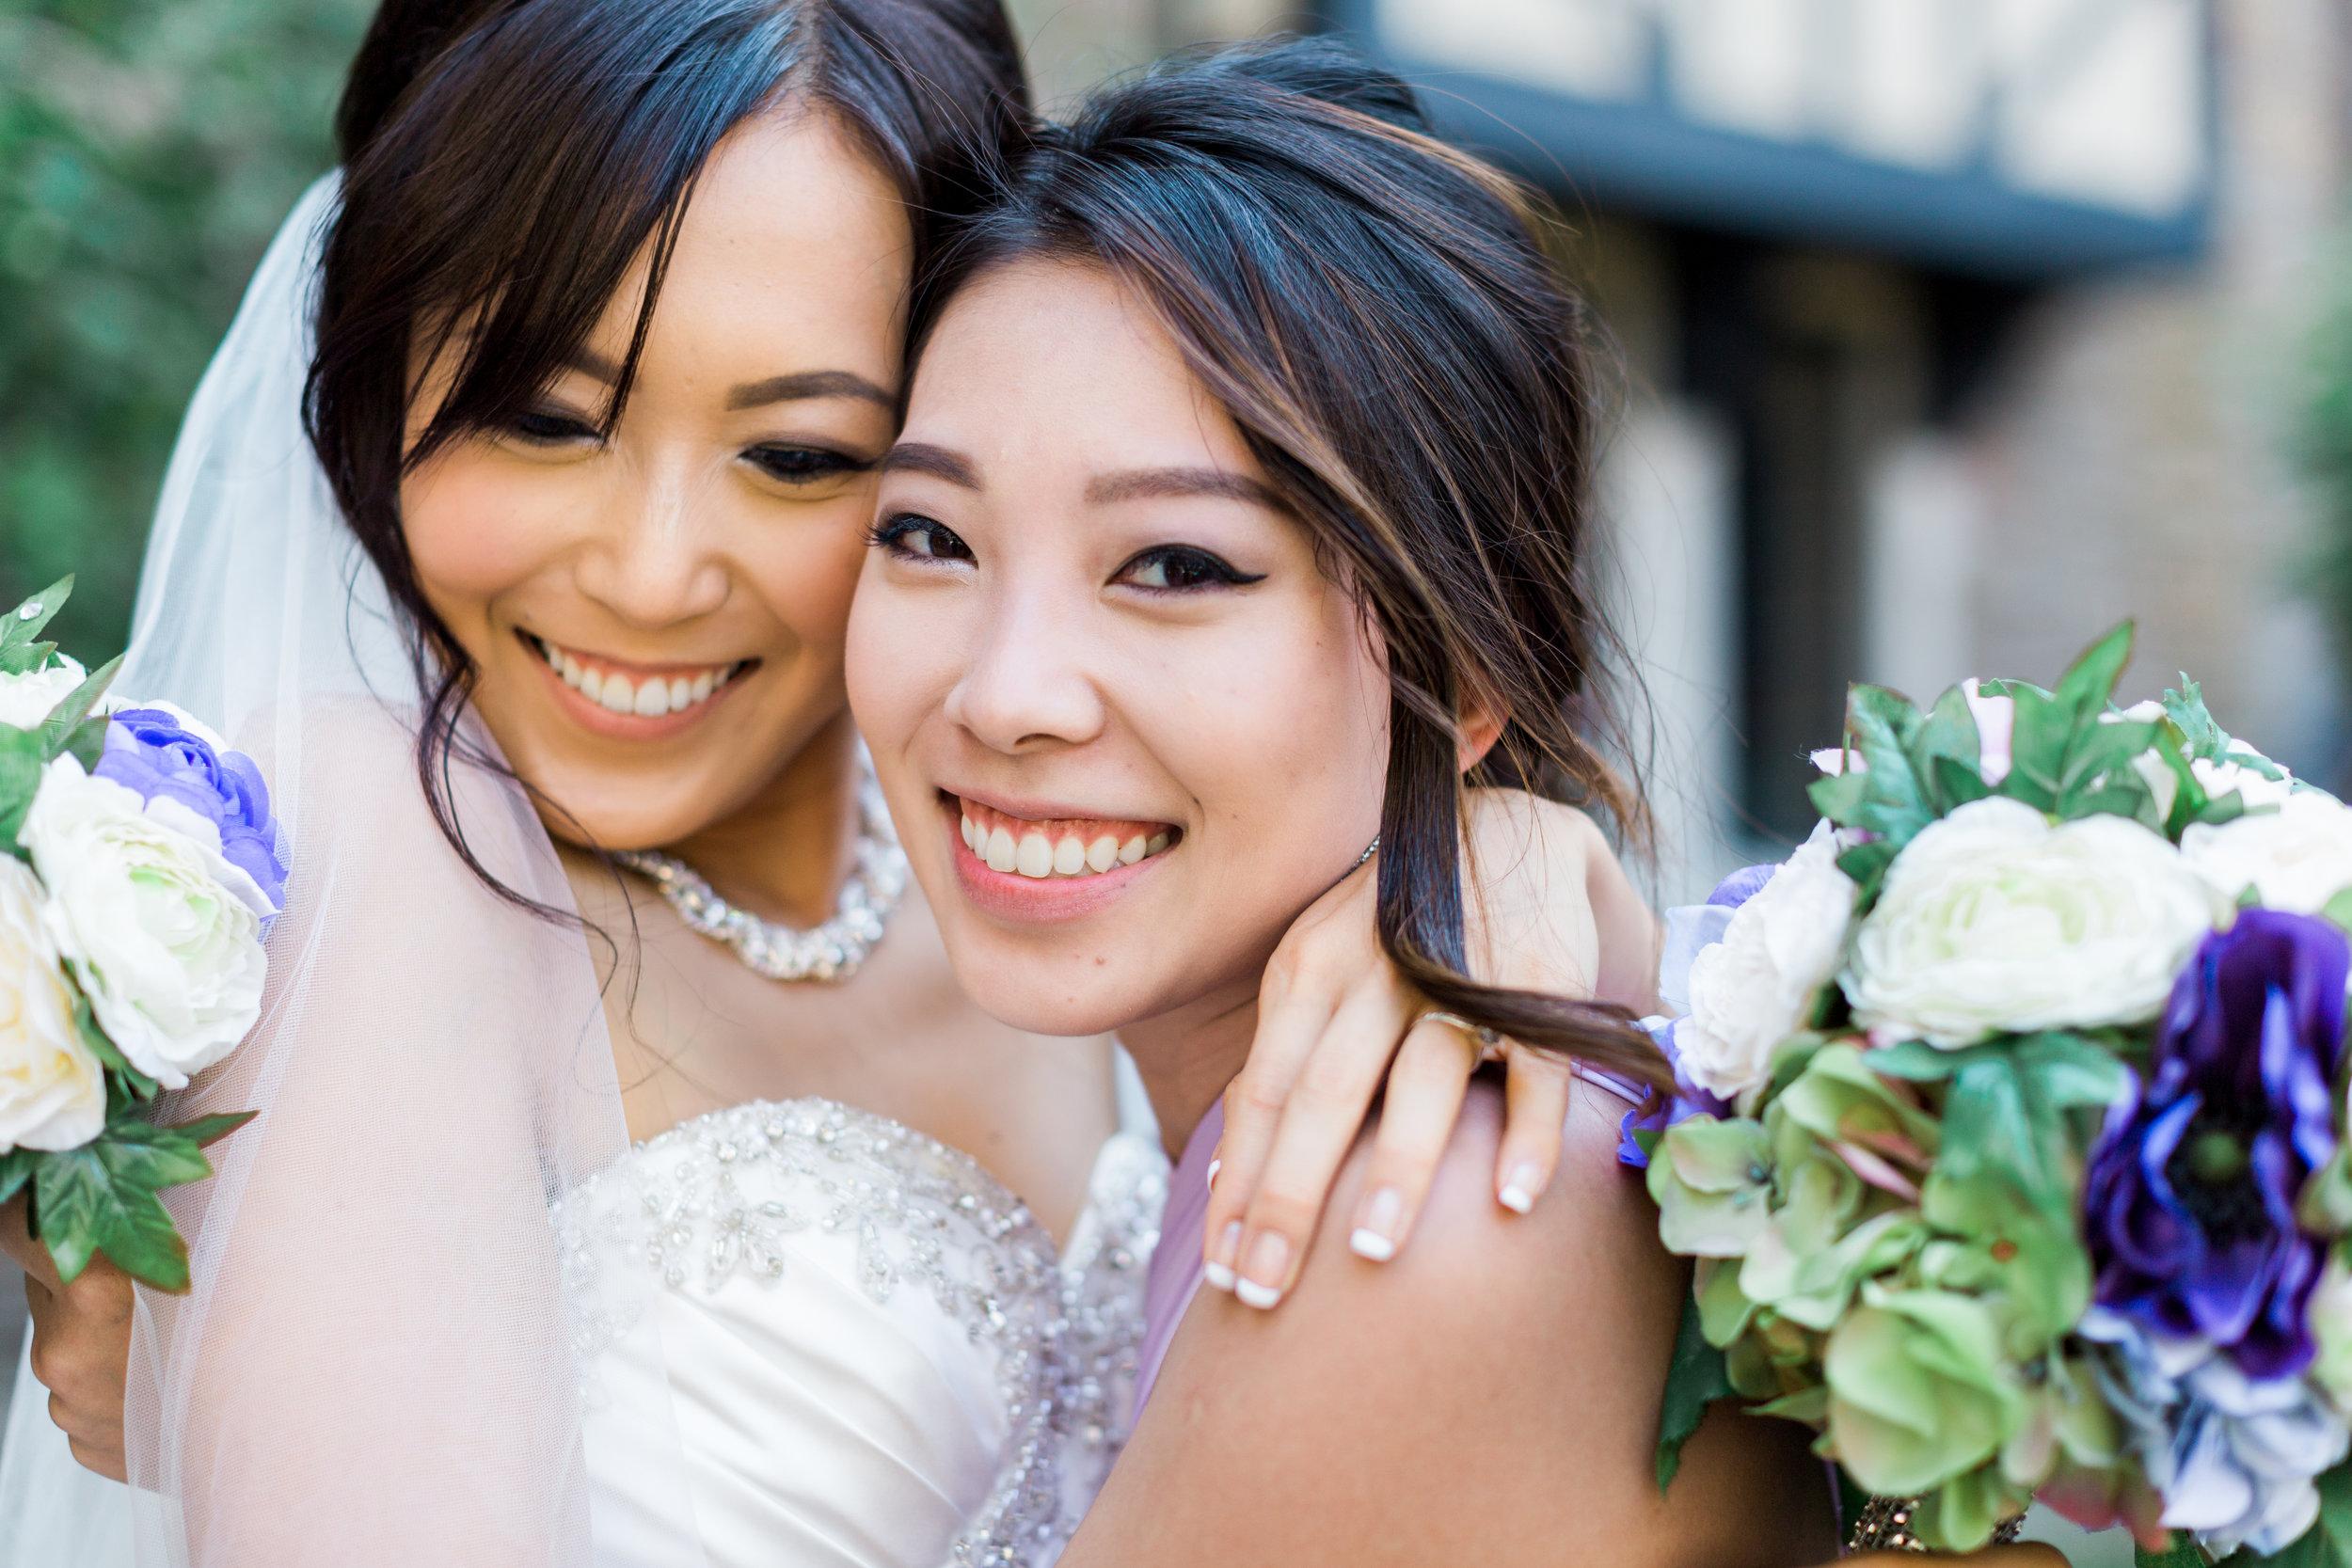 Toronto Fine Art Photographer - Old Mill Wedding - Bridesmaids Photos-24.jpg